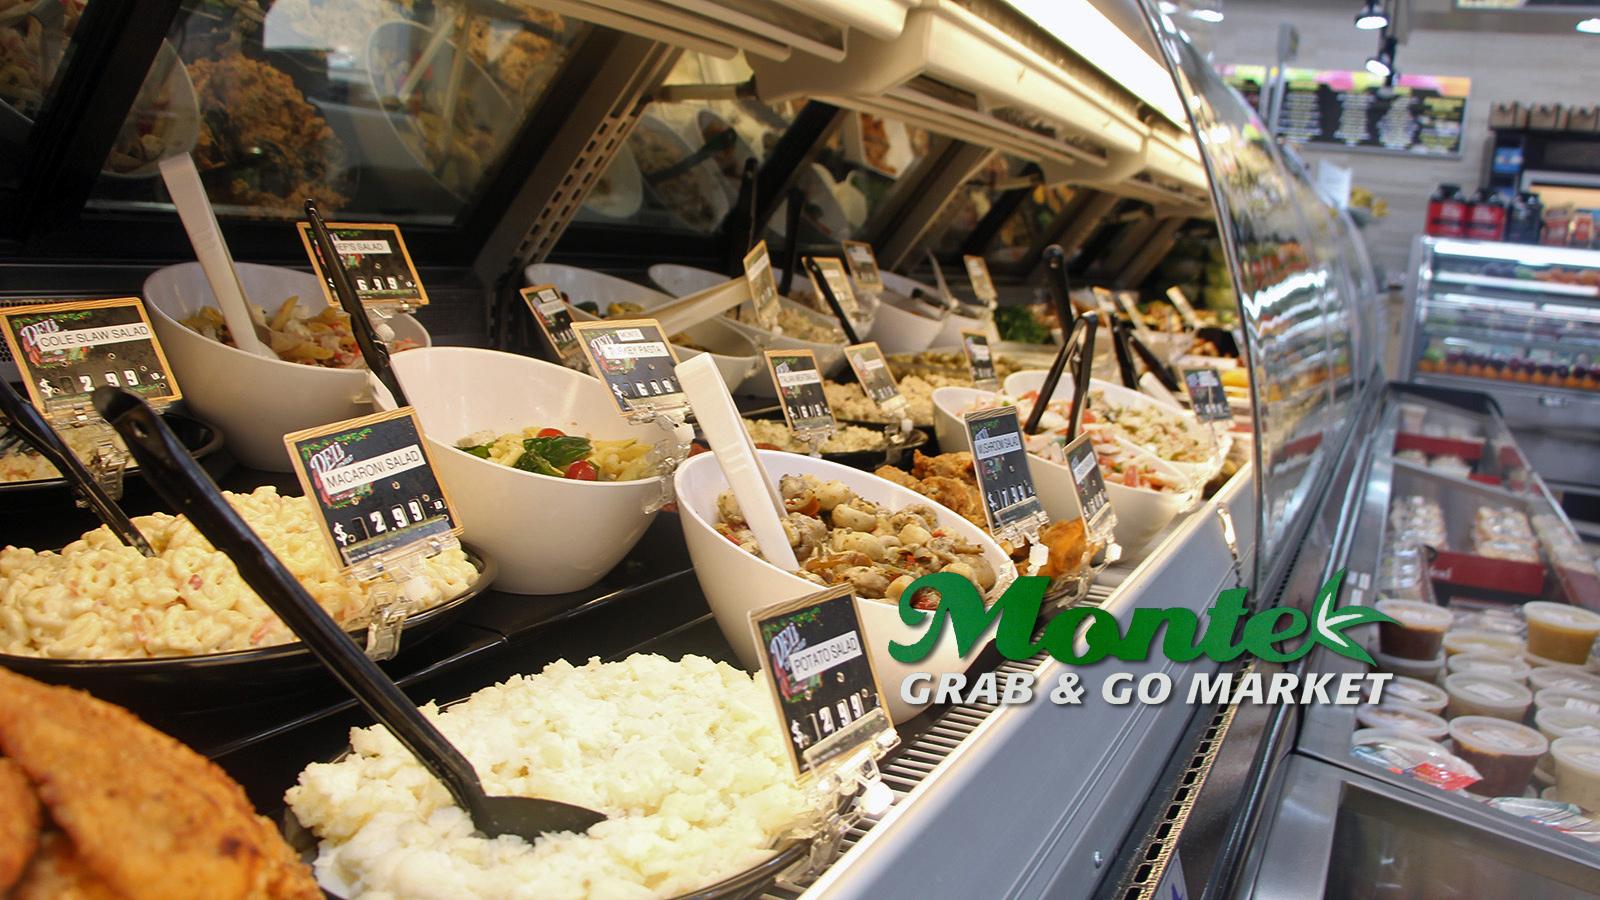 Monte Grab and Go Market Bronx NY